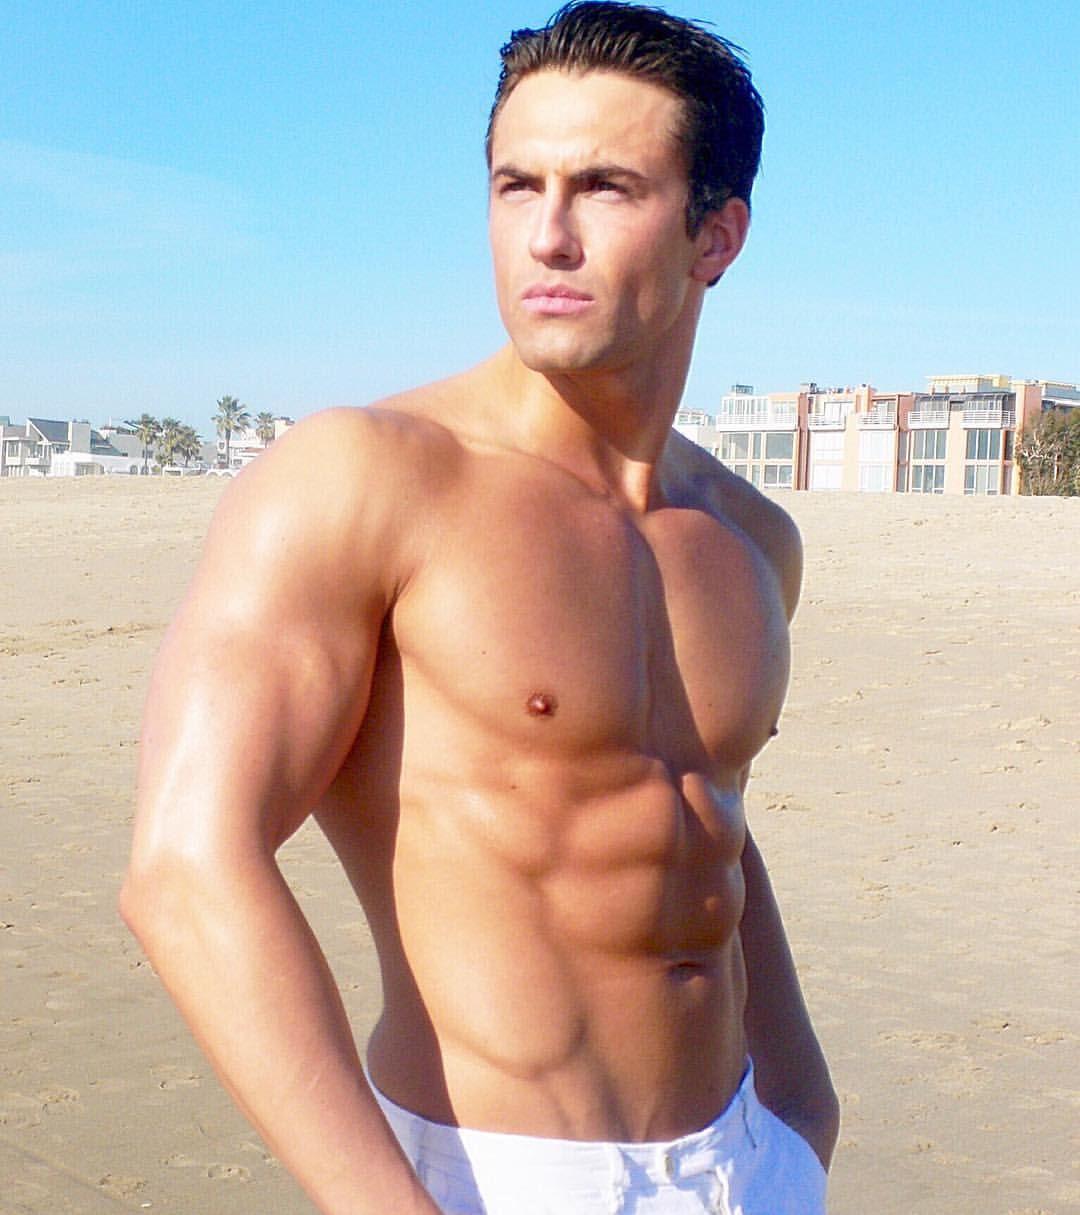 Lorenzo Antony sur Instagram: Venice Beach , Los Angeles ....Have a great day  #lorenzoantony